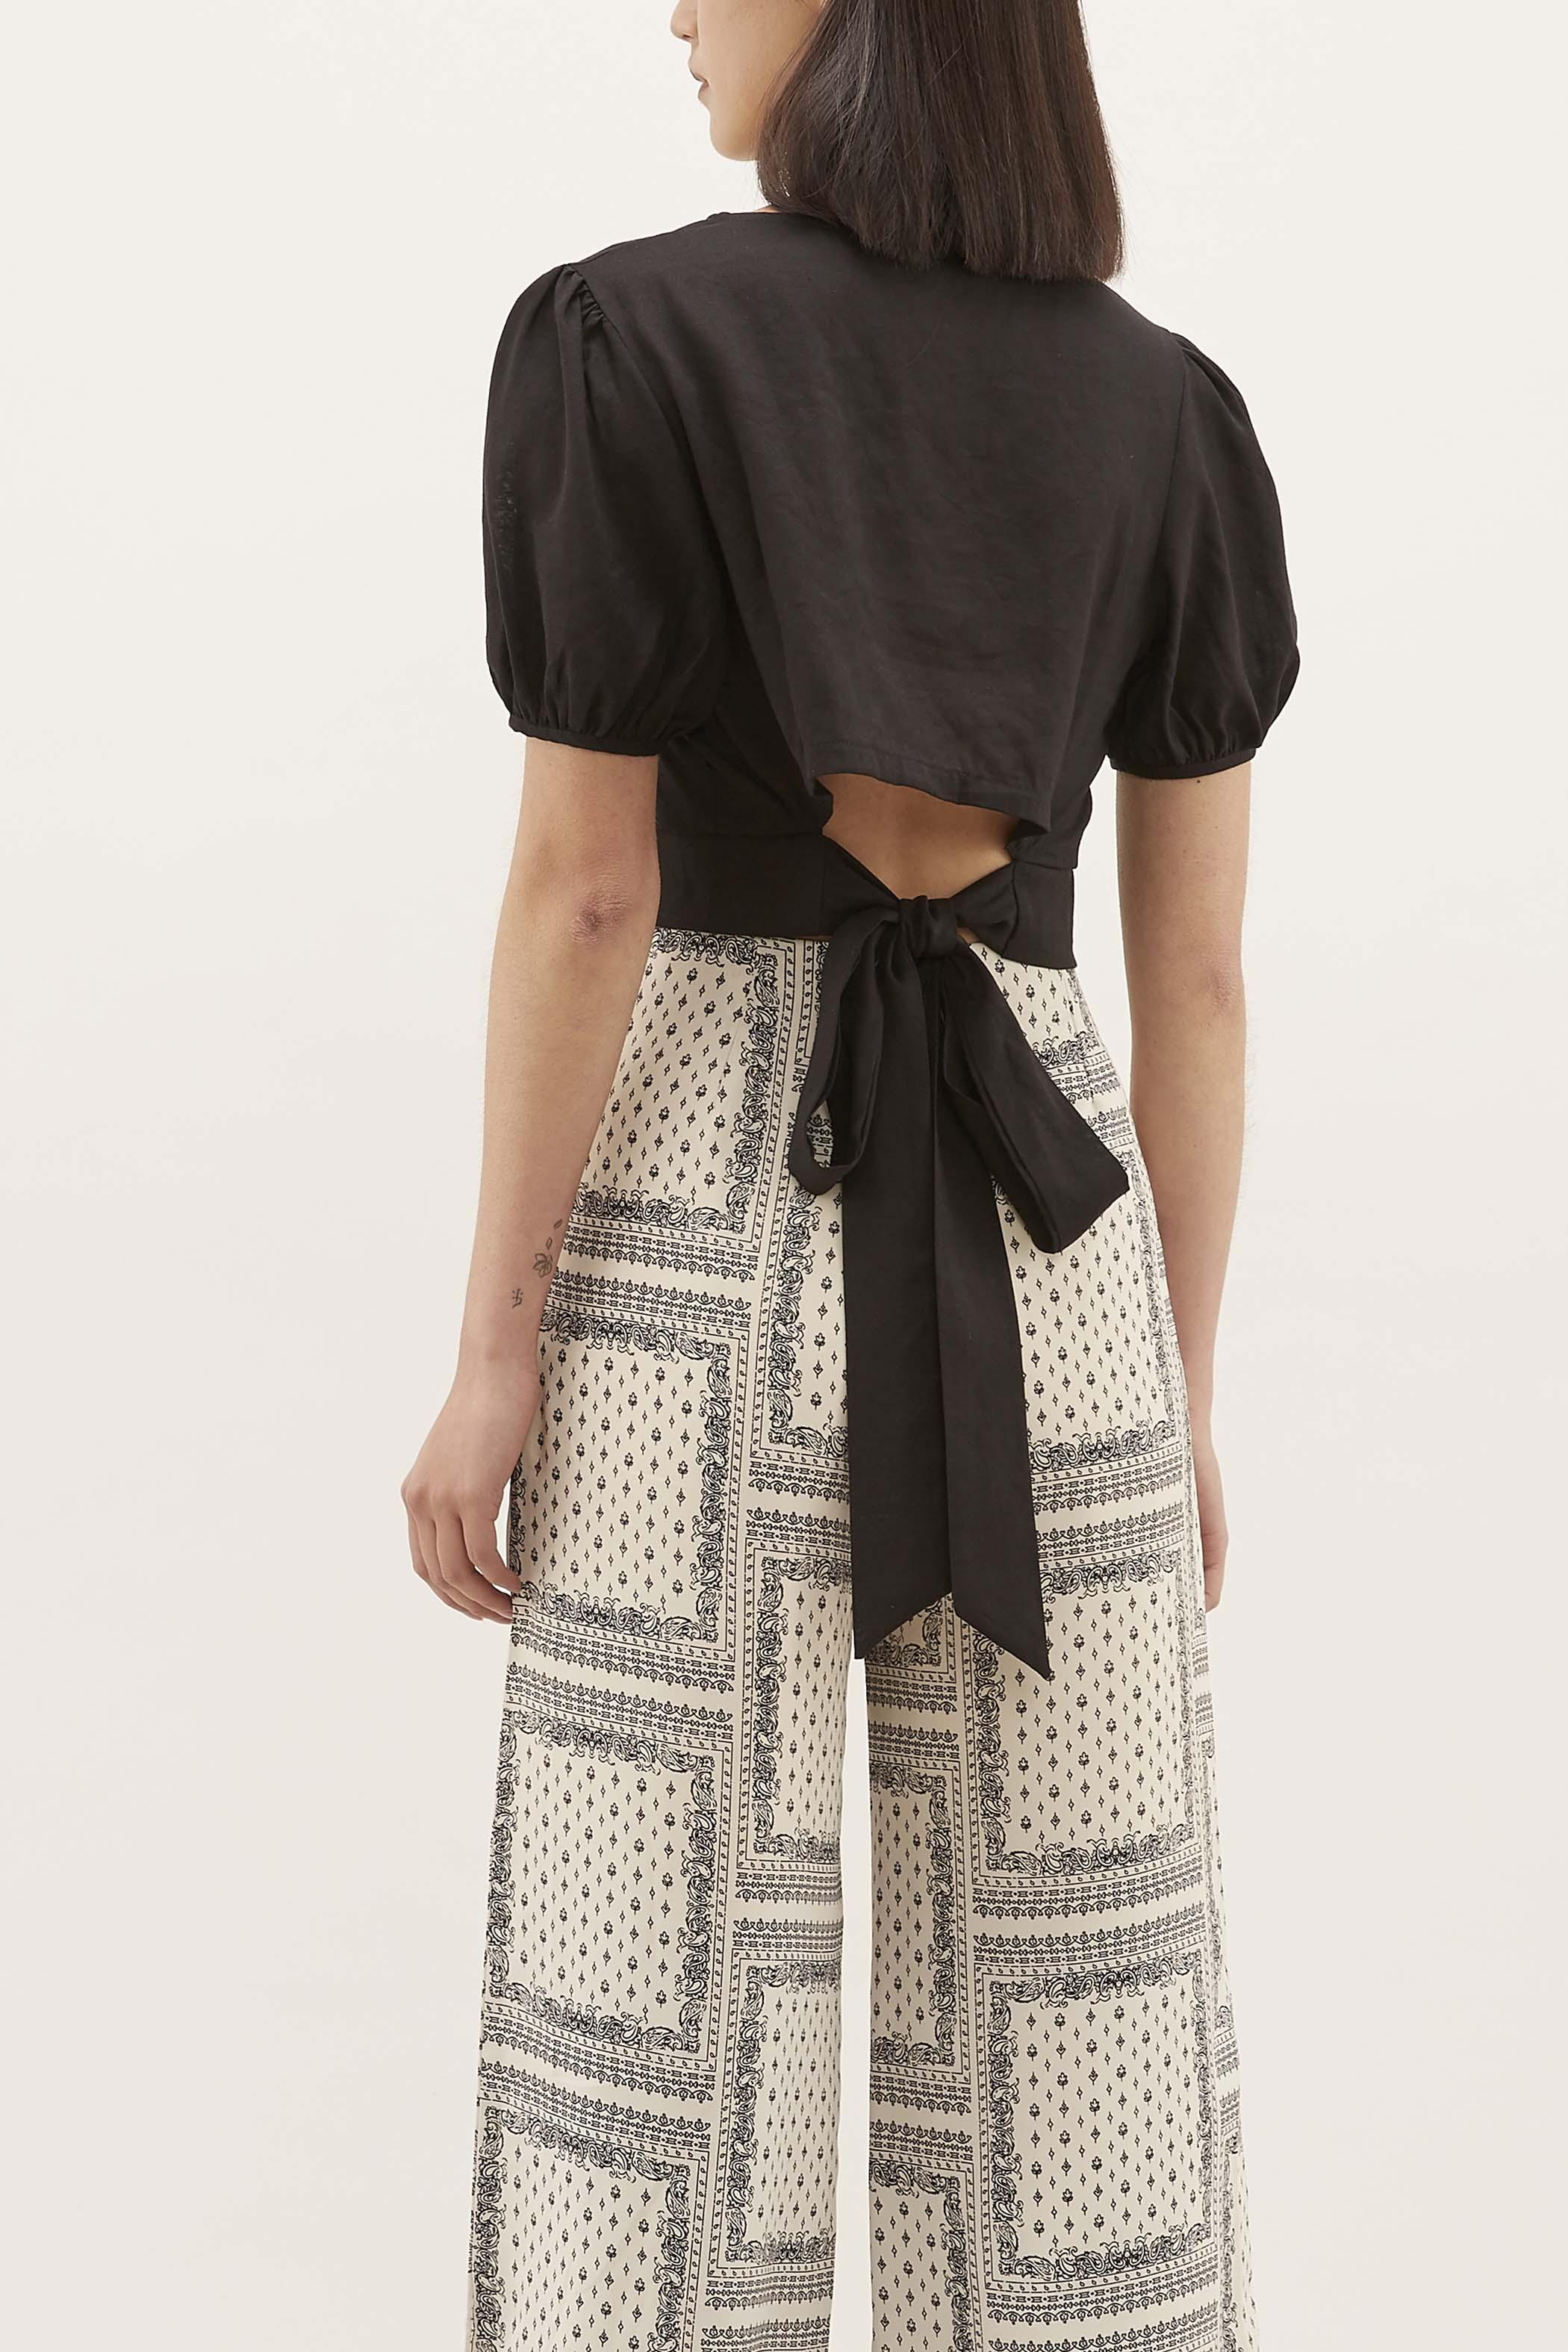 Fenella Back-tie Blouse